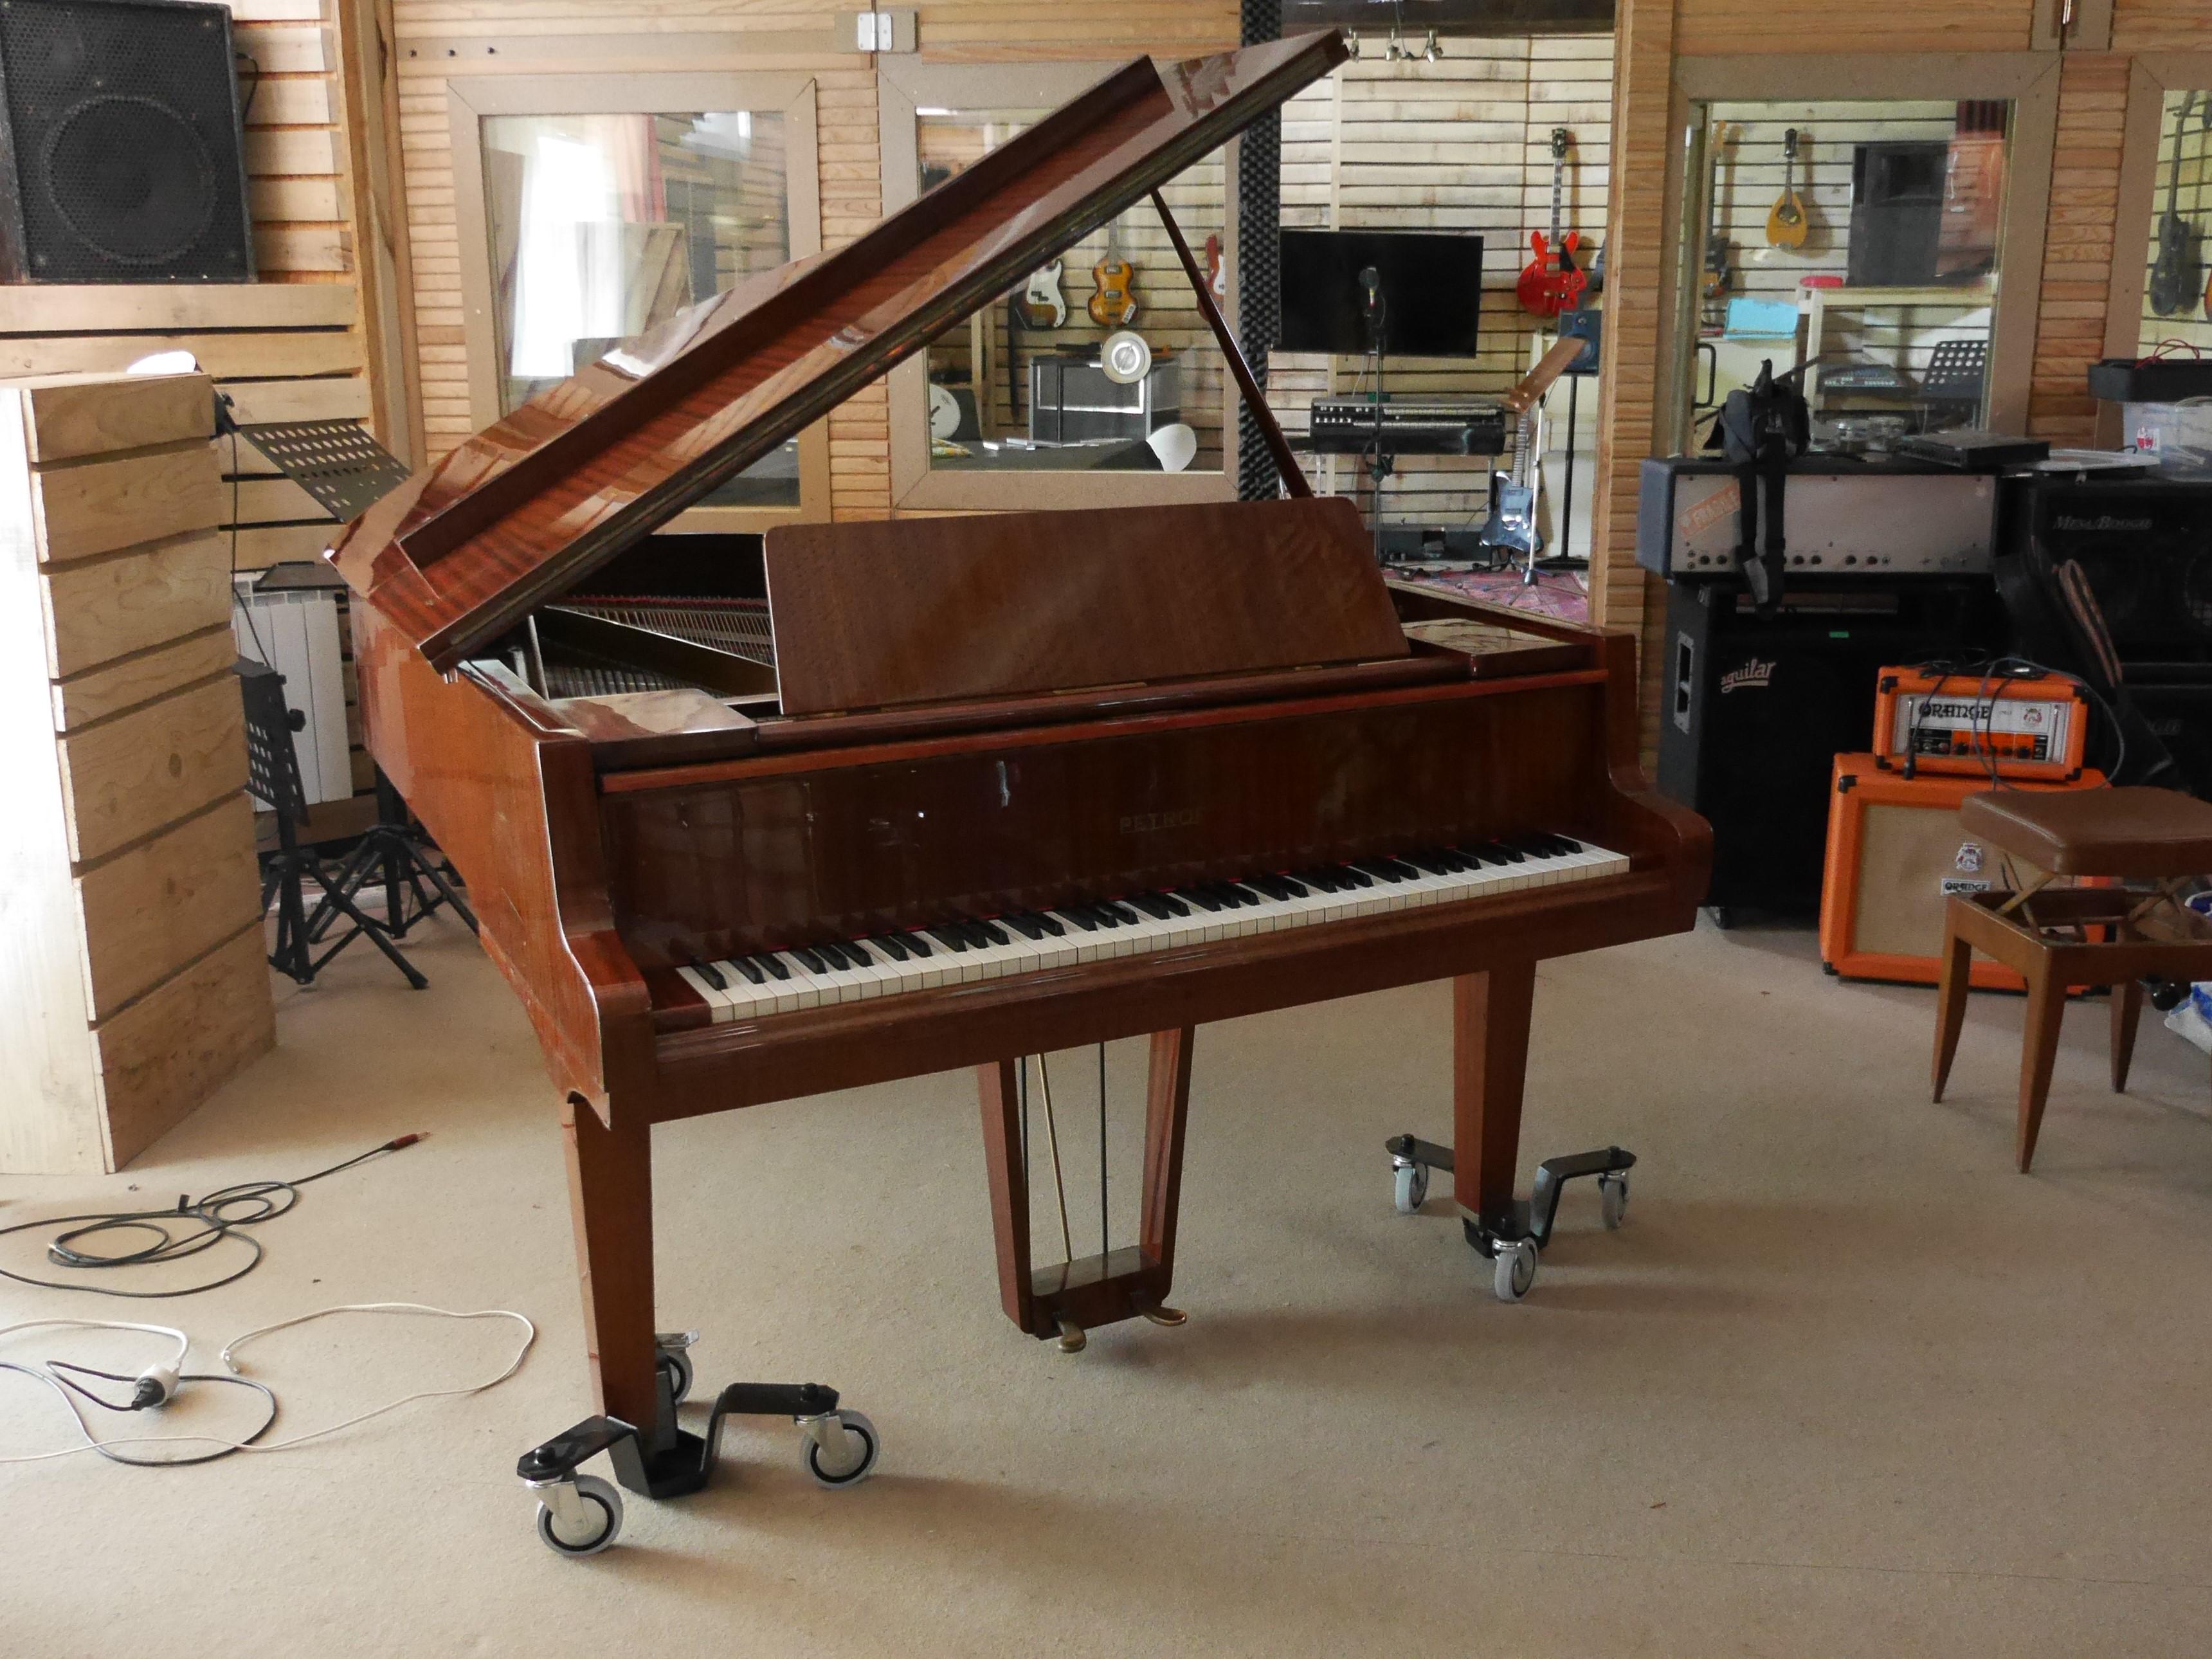 studio la boite a meuh - piano demi queue petrof 192